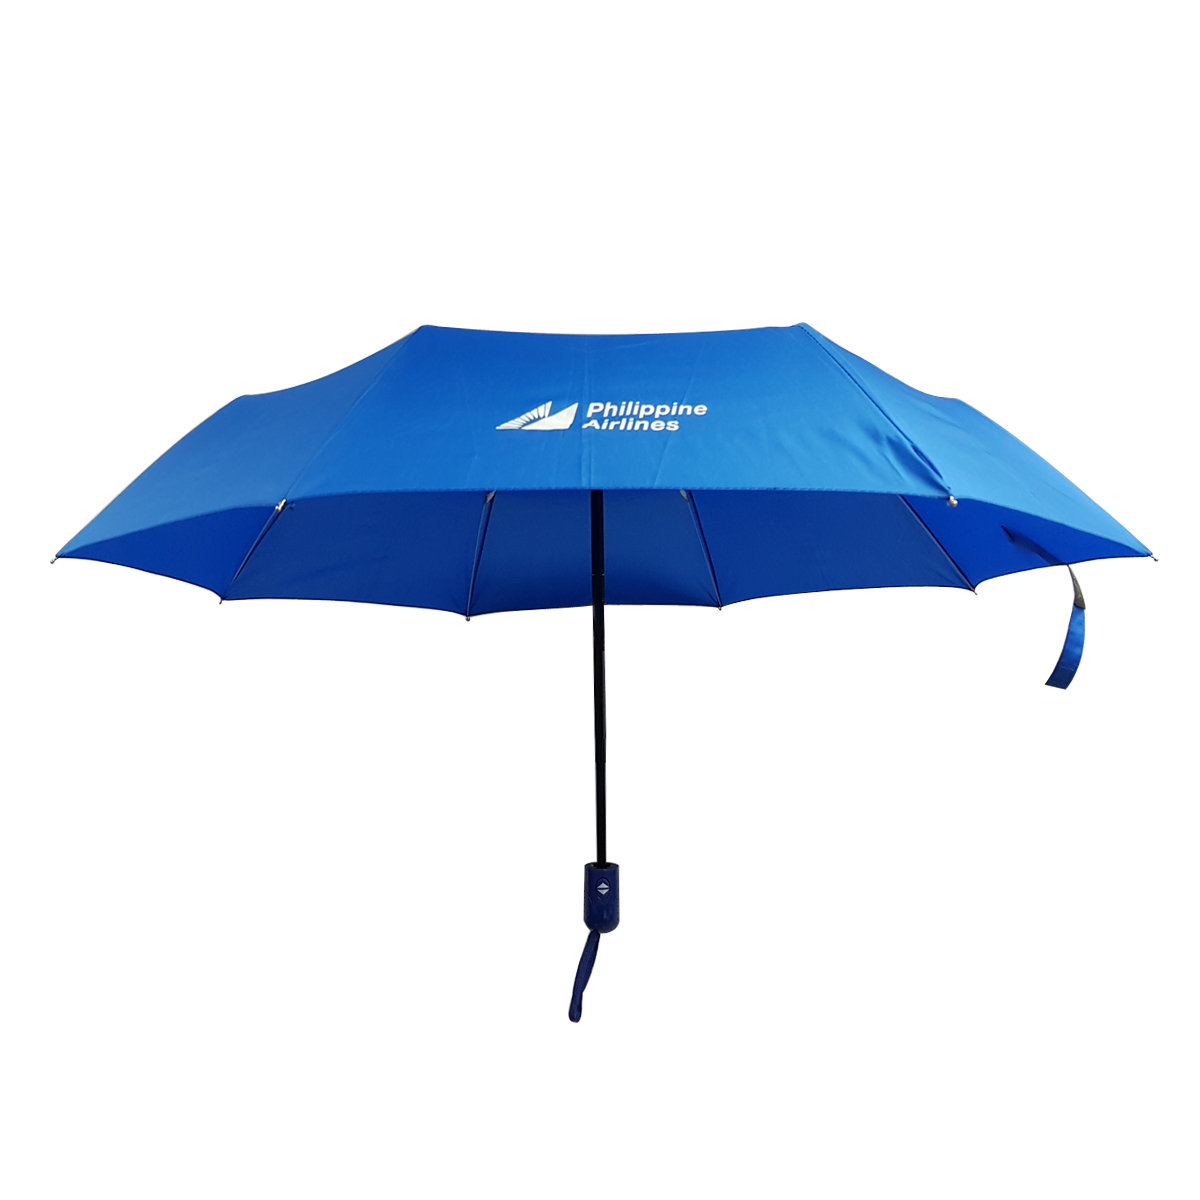 PAL Exclusives Foldable Umbrella